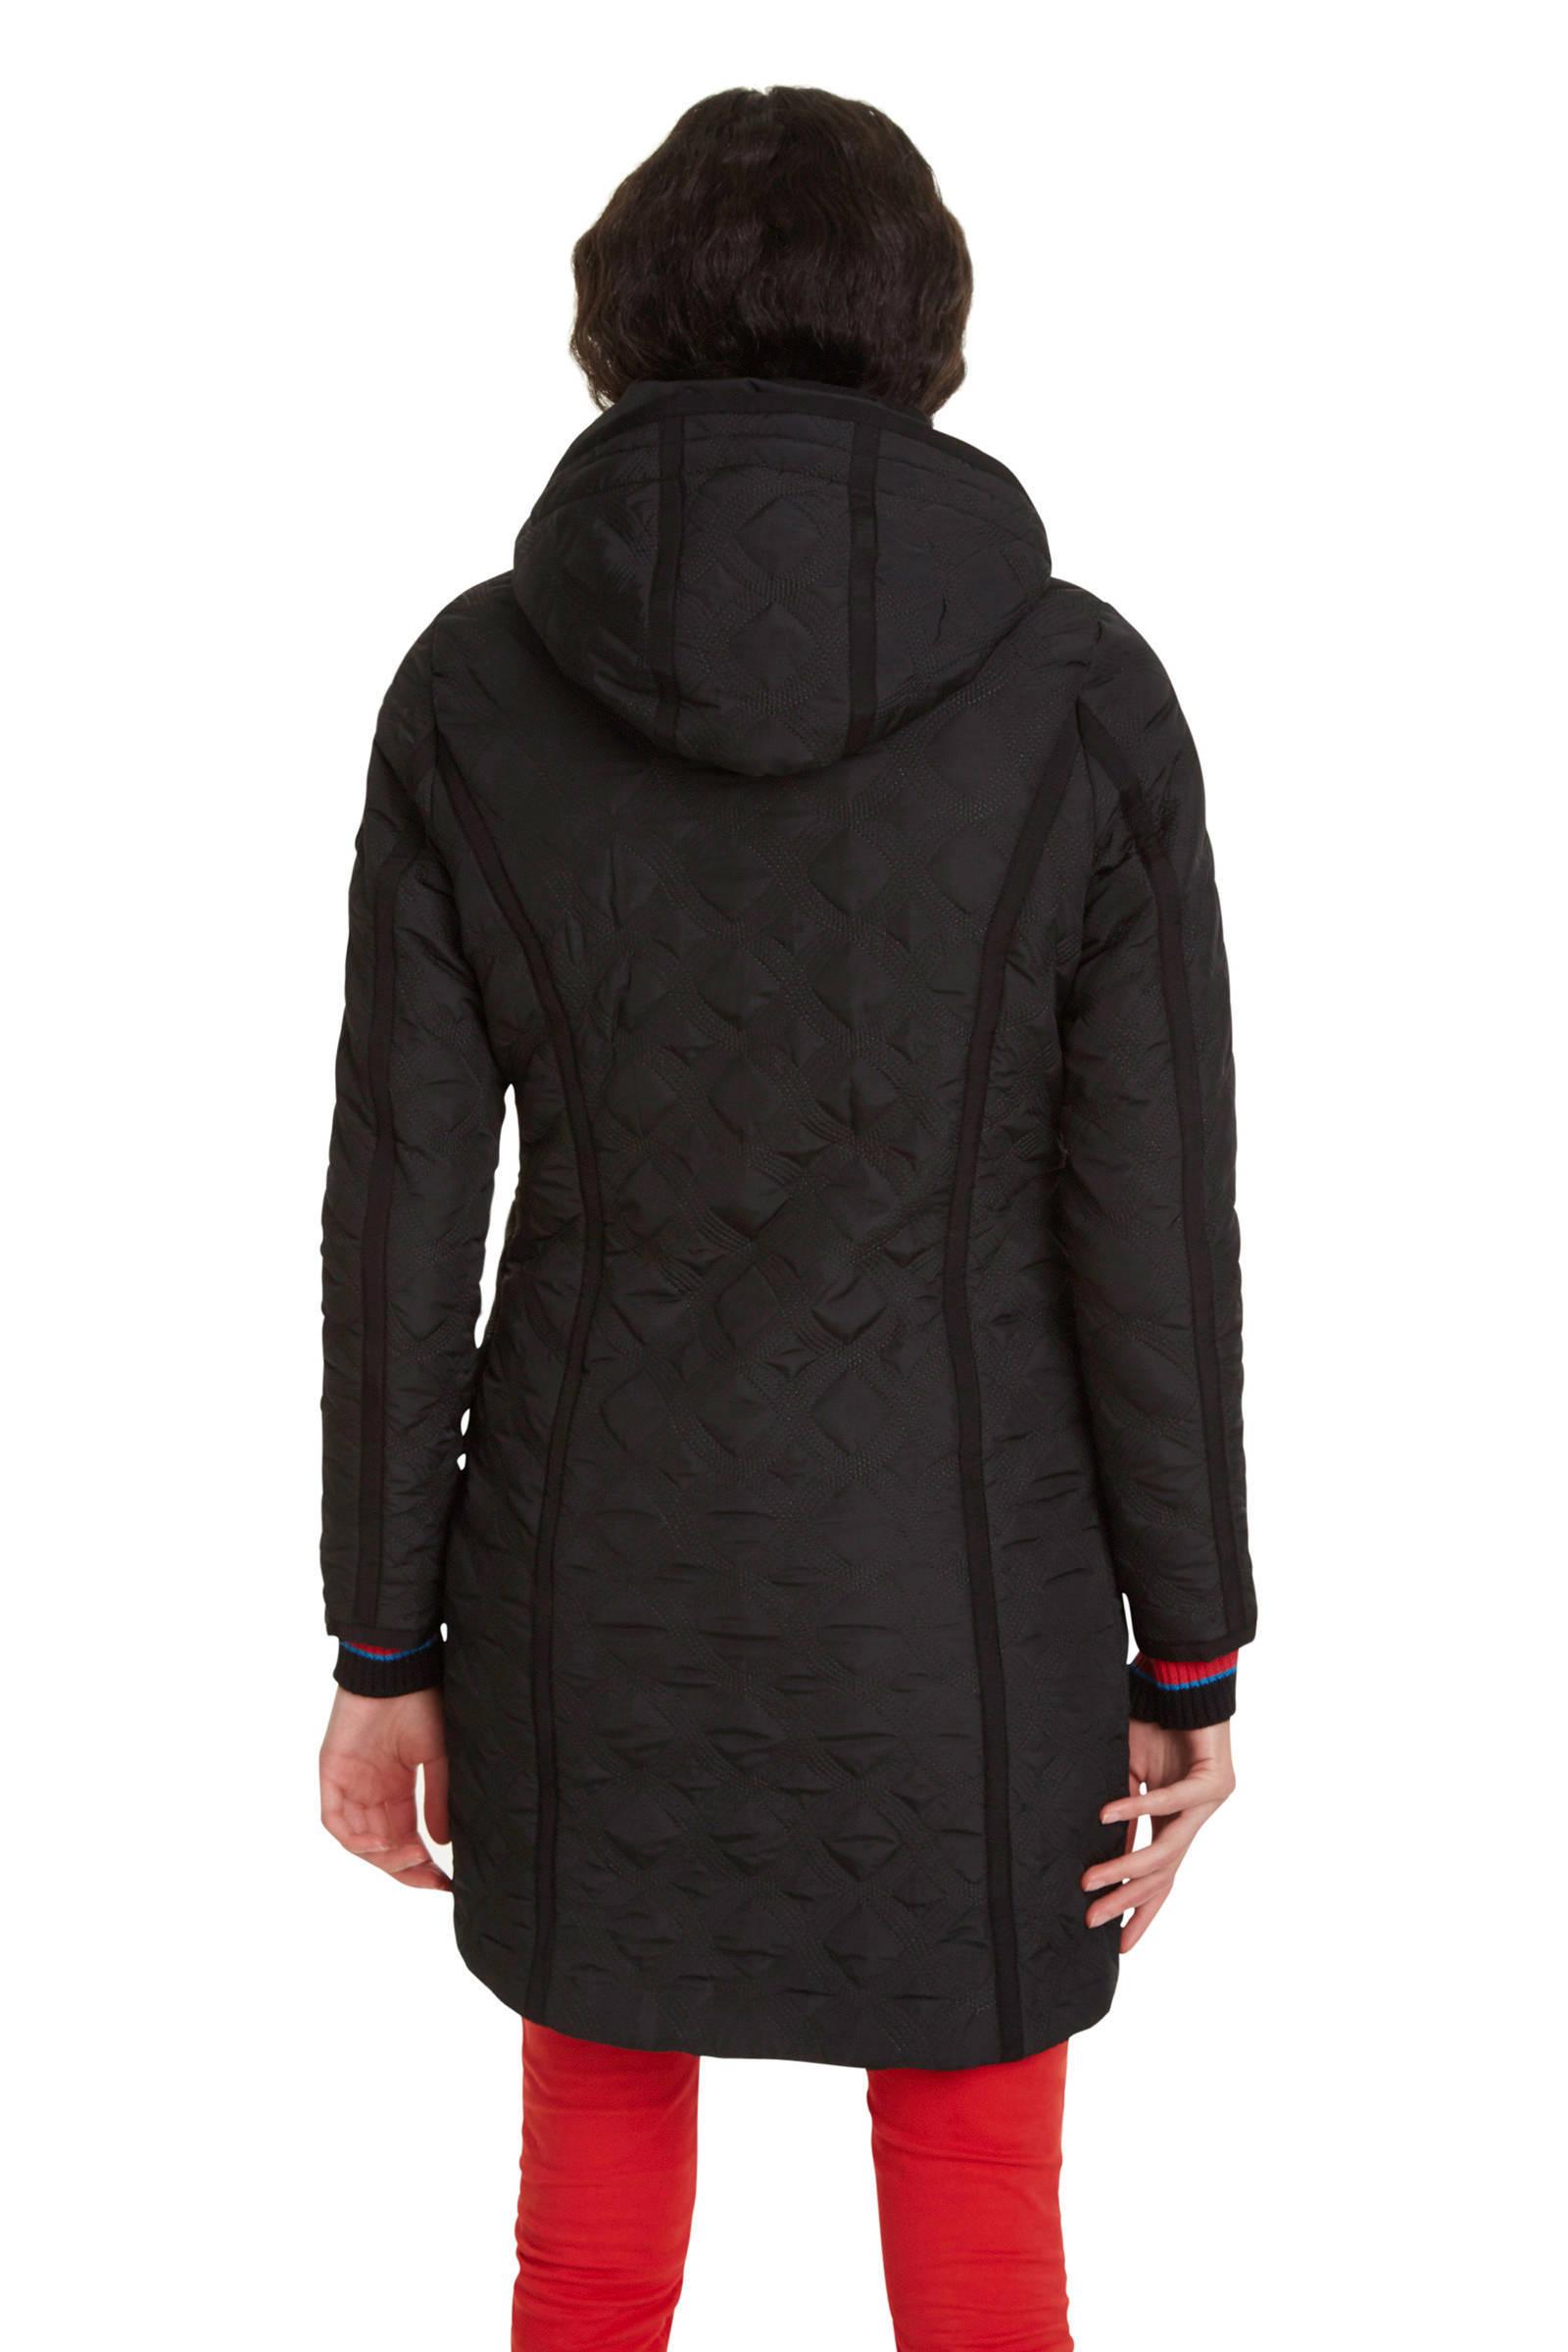 Hedendaags Desigual winterjas zwart | wehkamp QN-79